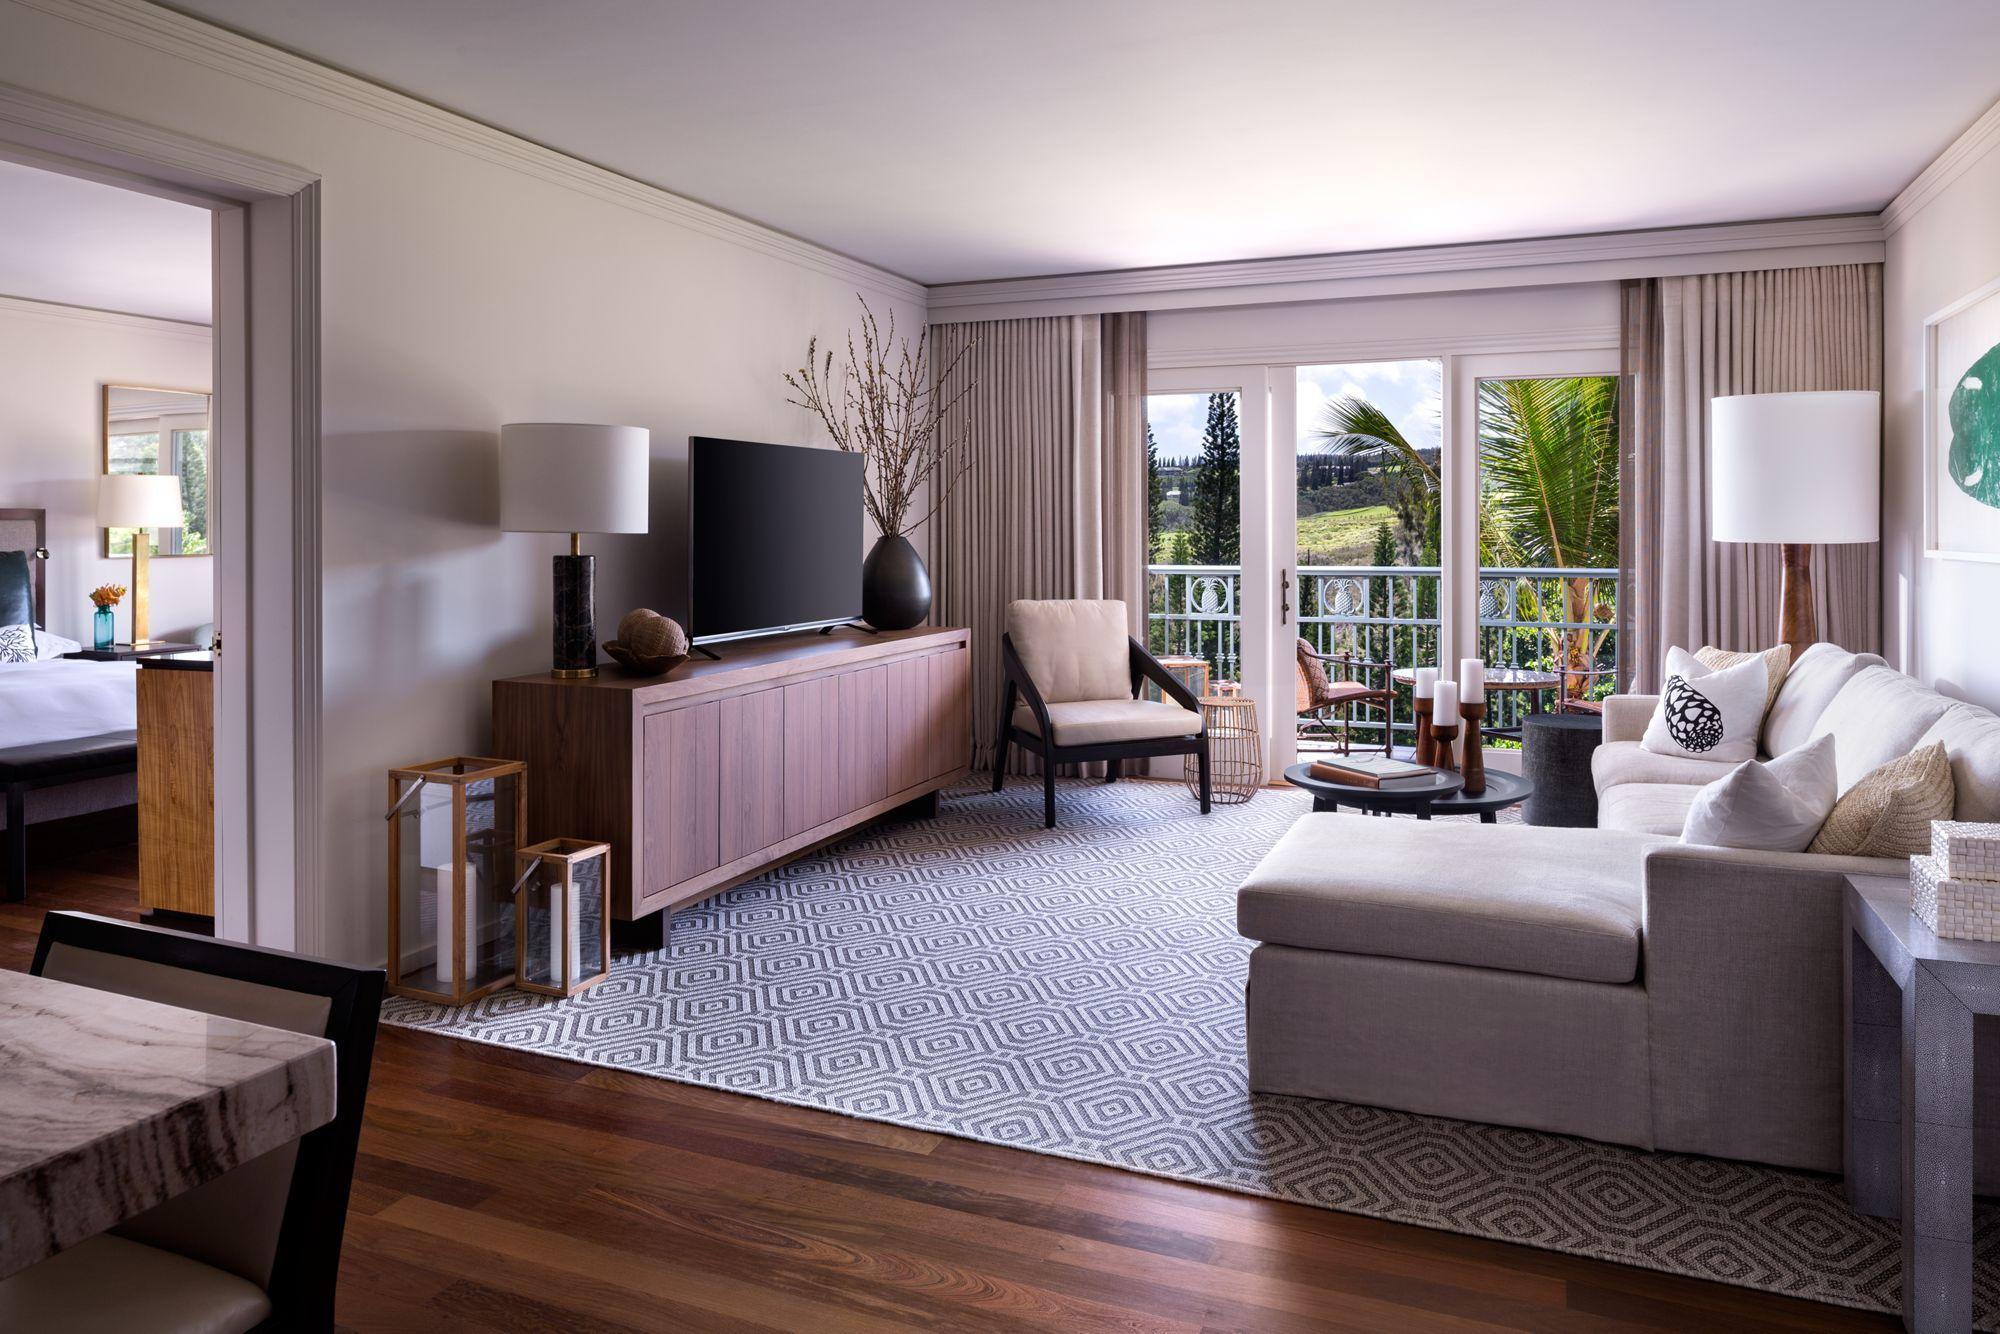 Fiji-Travel-Network-Ritz-Carlton-Kapalua-13